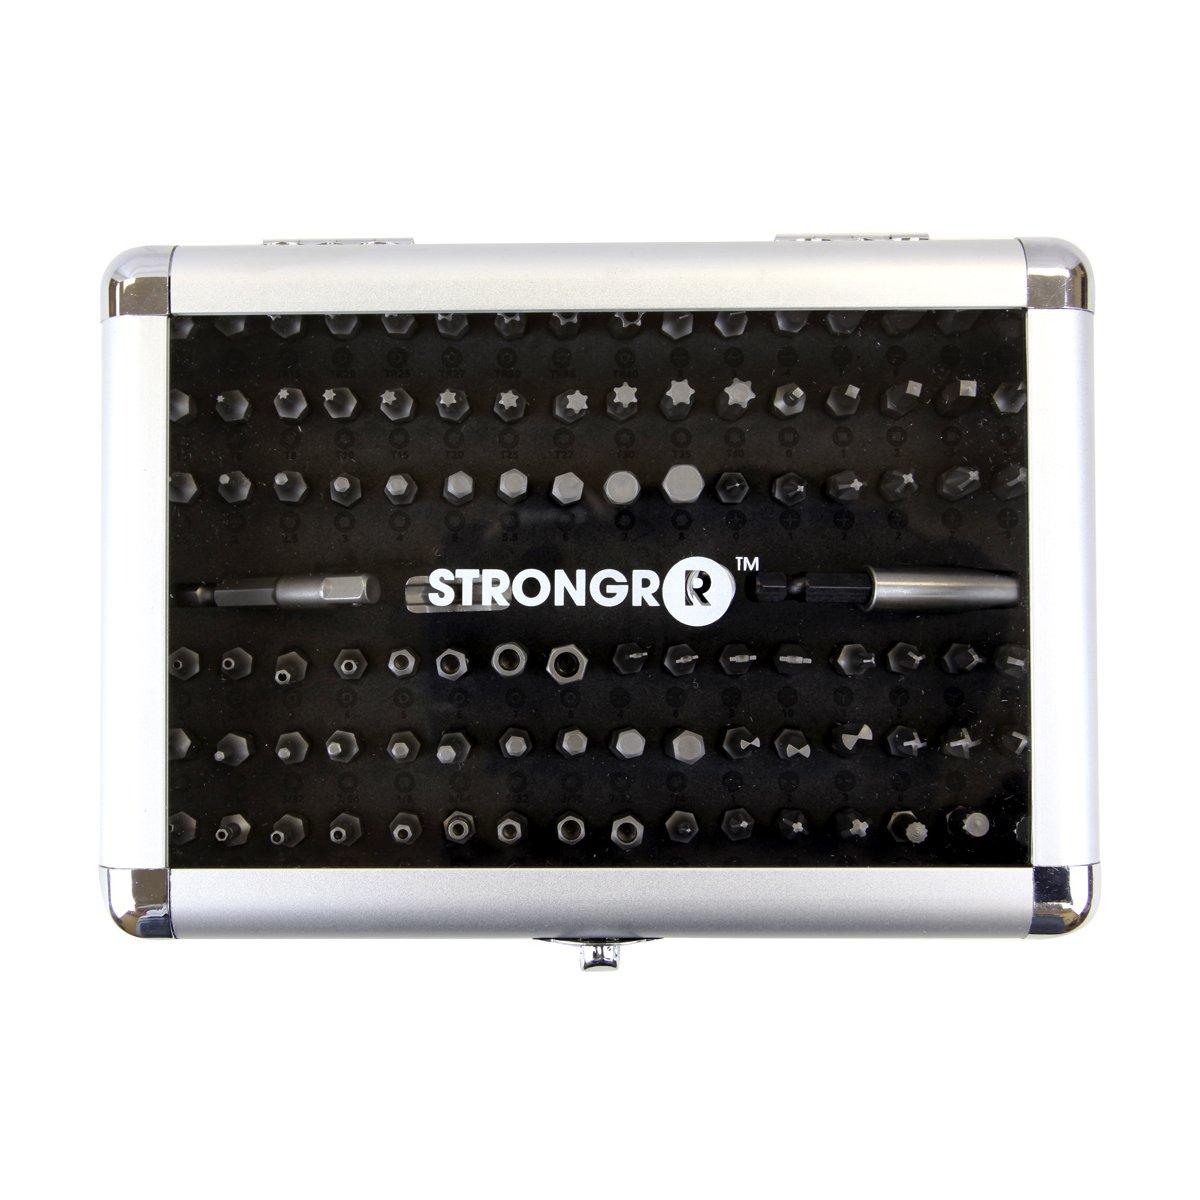 Strongrr Macro Bit Set – 100 Pieces